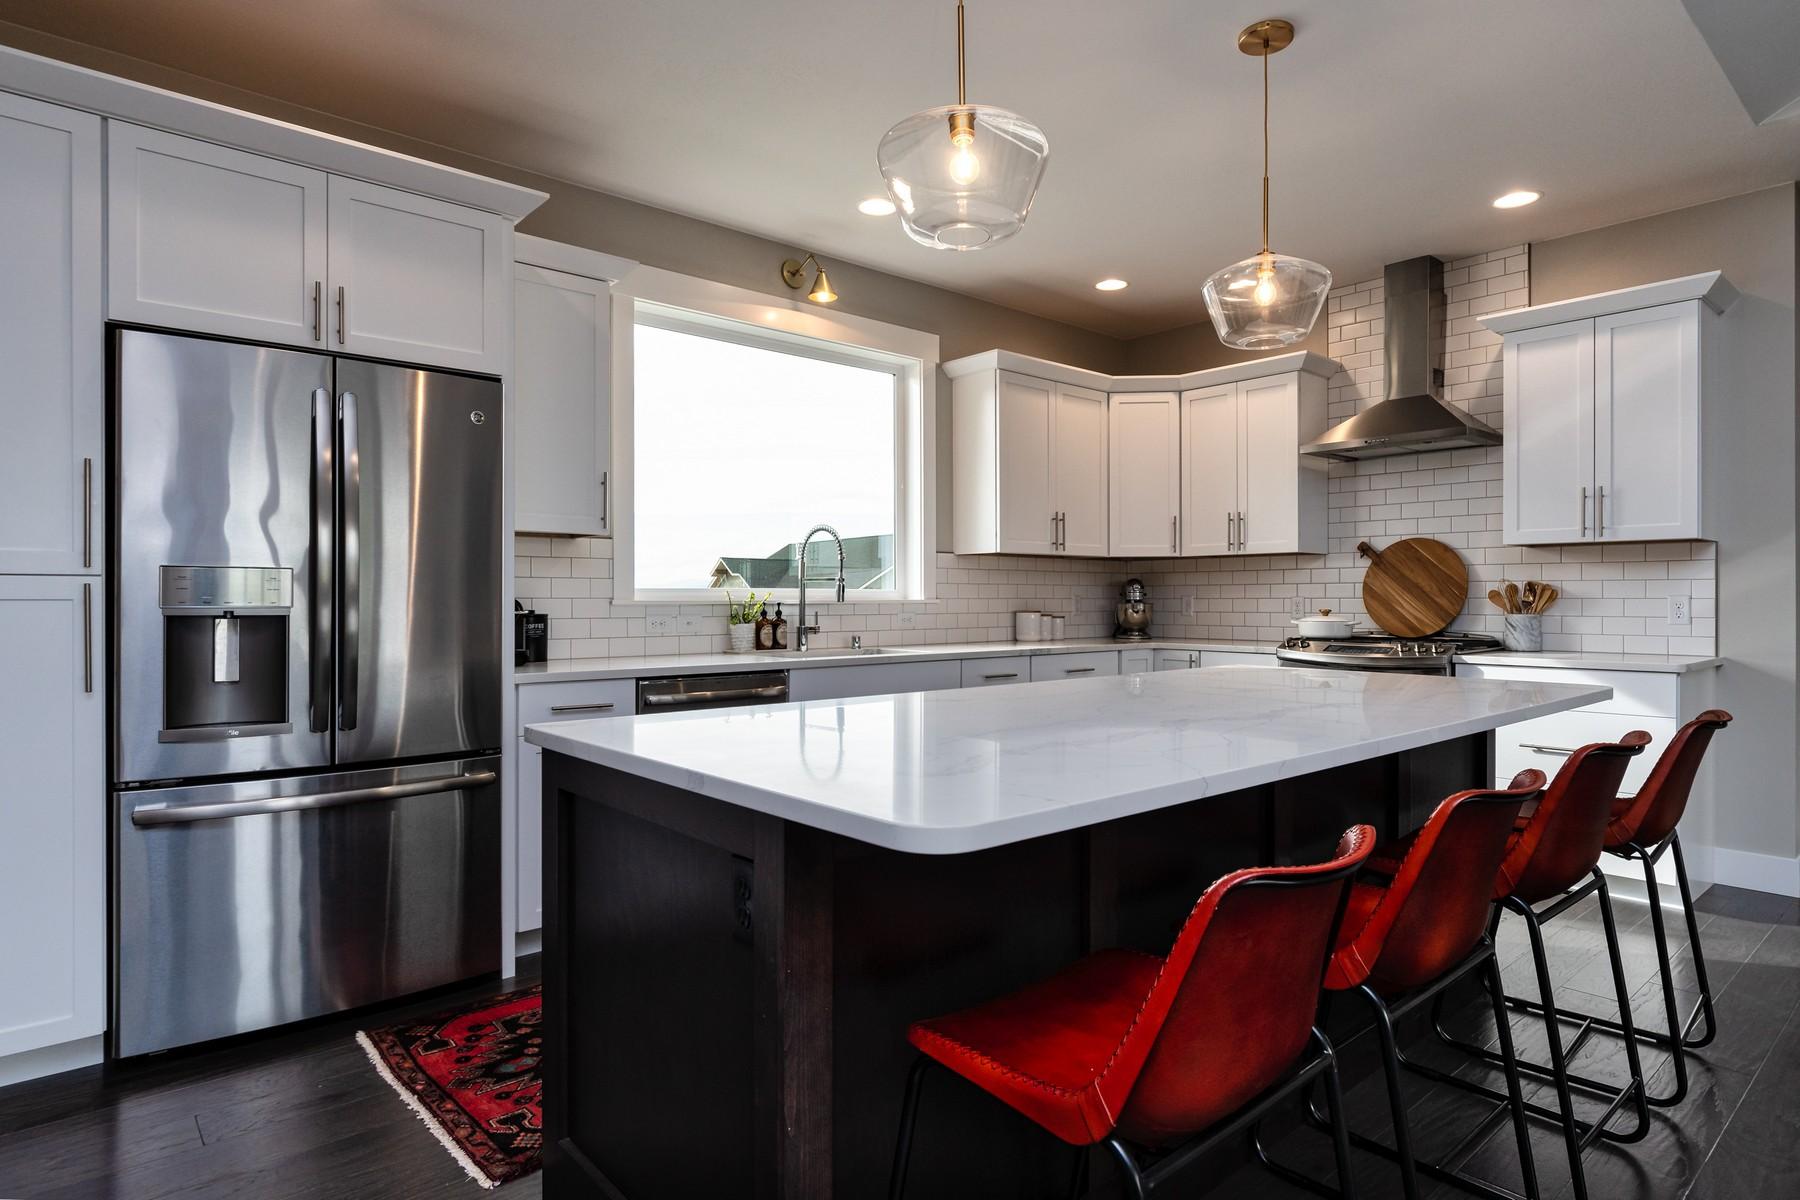 Single Family Homes for Sale at 2928 Prada Drive Missoula, Montana 59808 United States